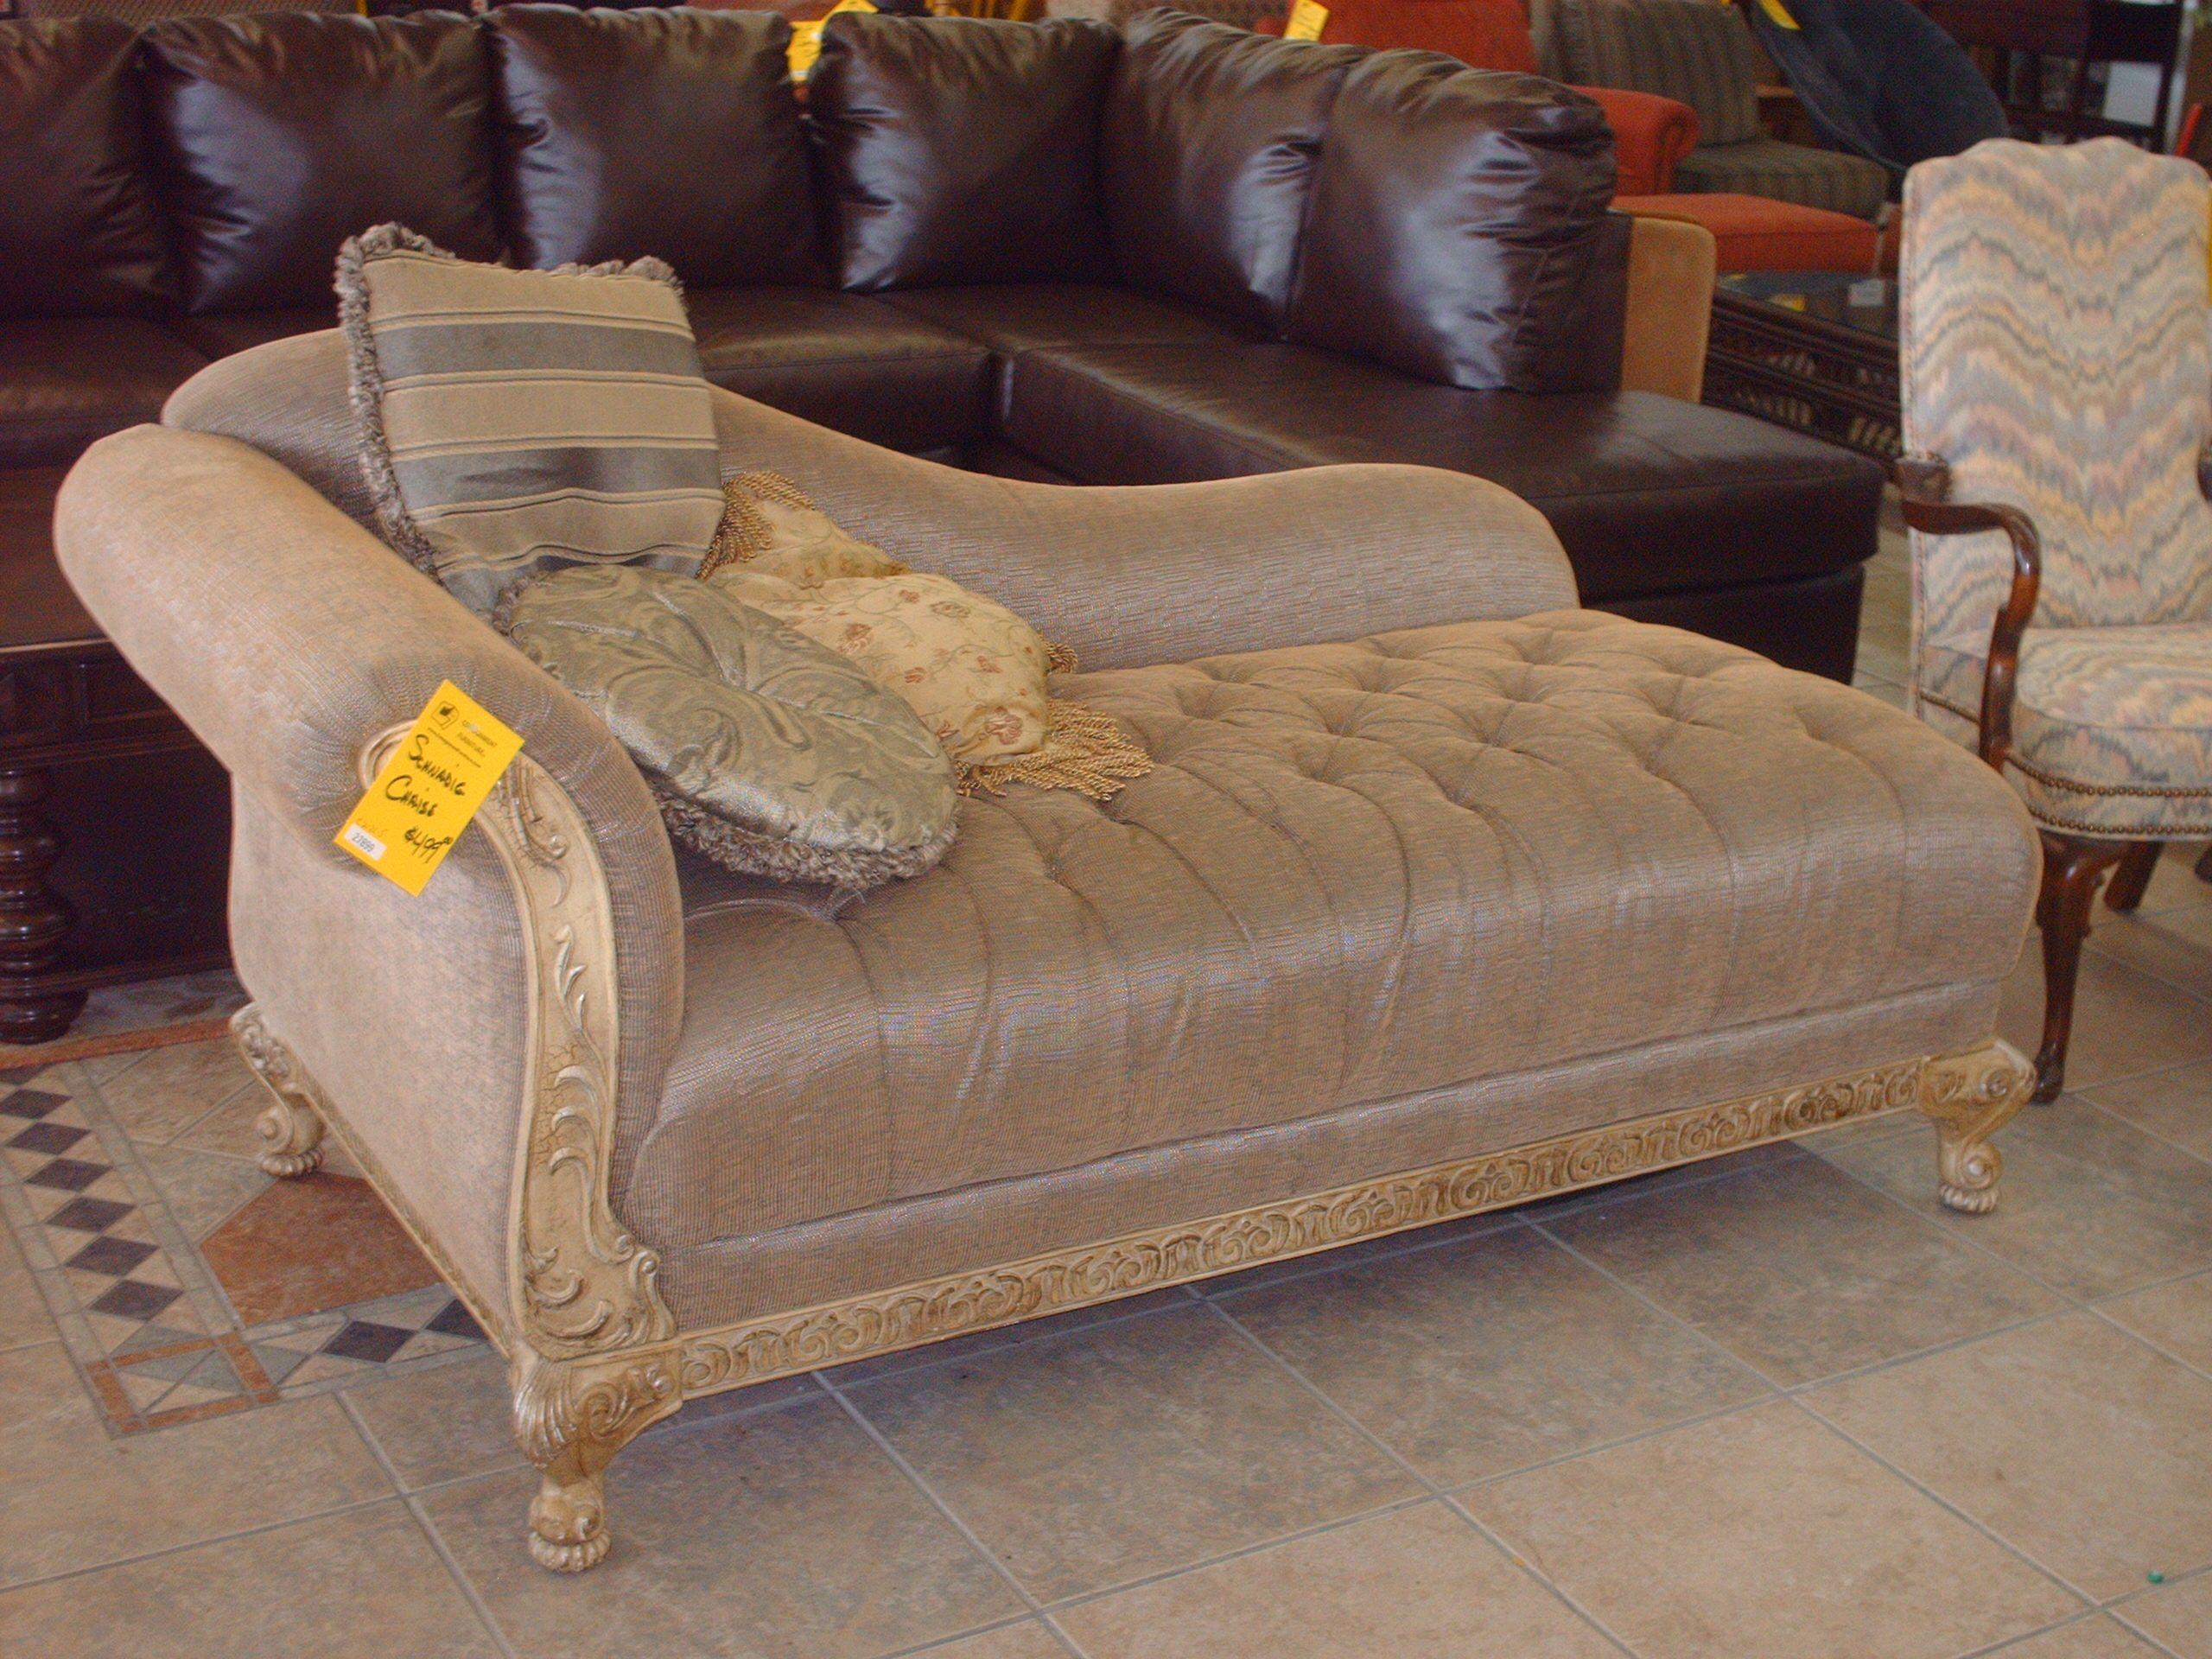 Consignment Furniture   Schnadig Chaise   $425   Consignment Furniture    Tulsa, OK